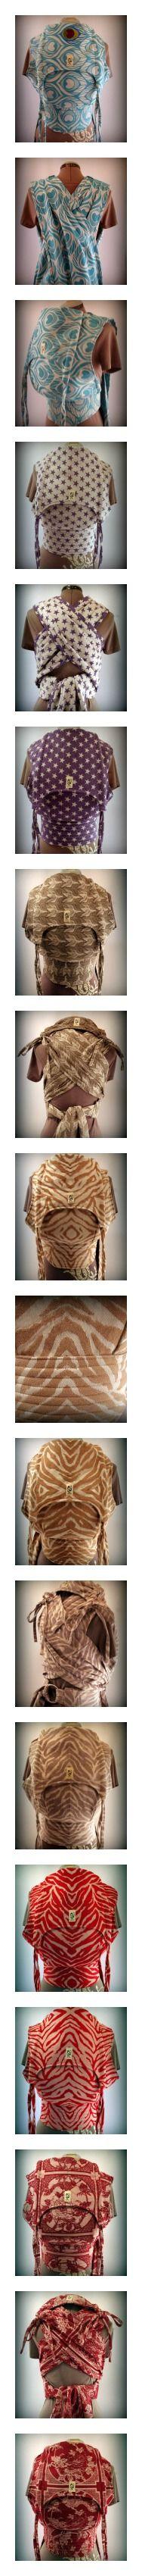 ObiMama Artipoppe Wrap Conversion Mei Tais